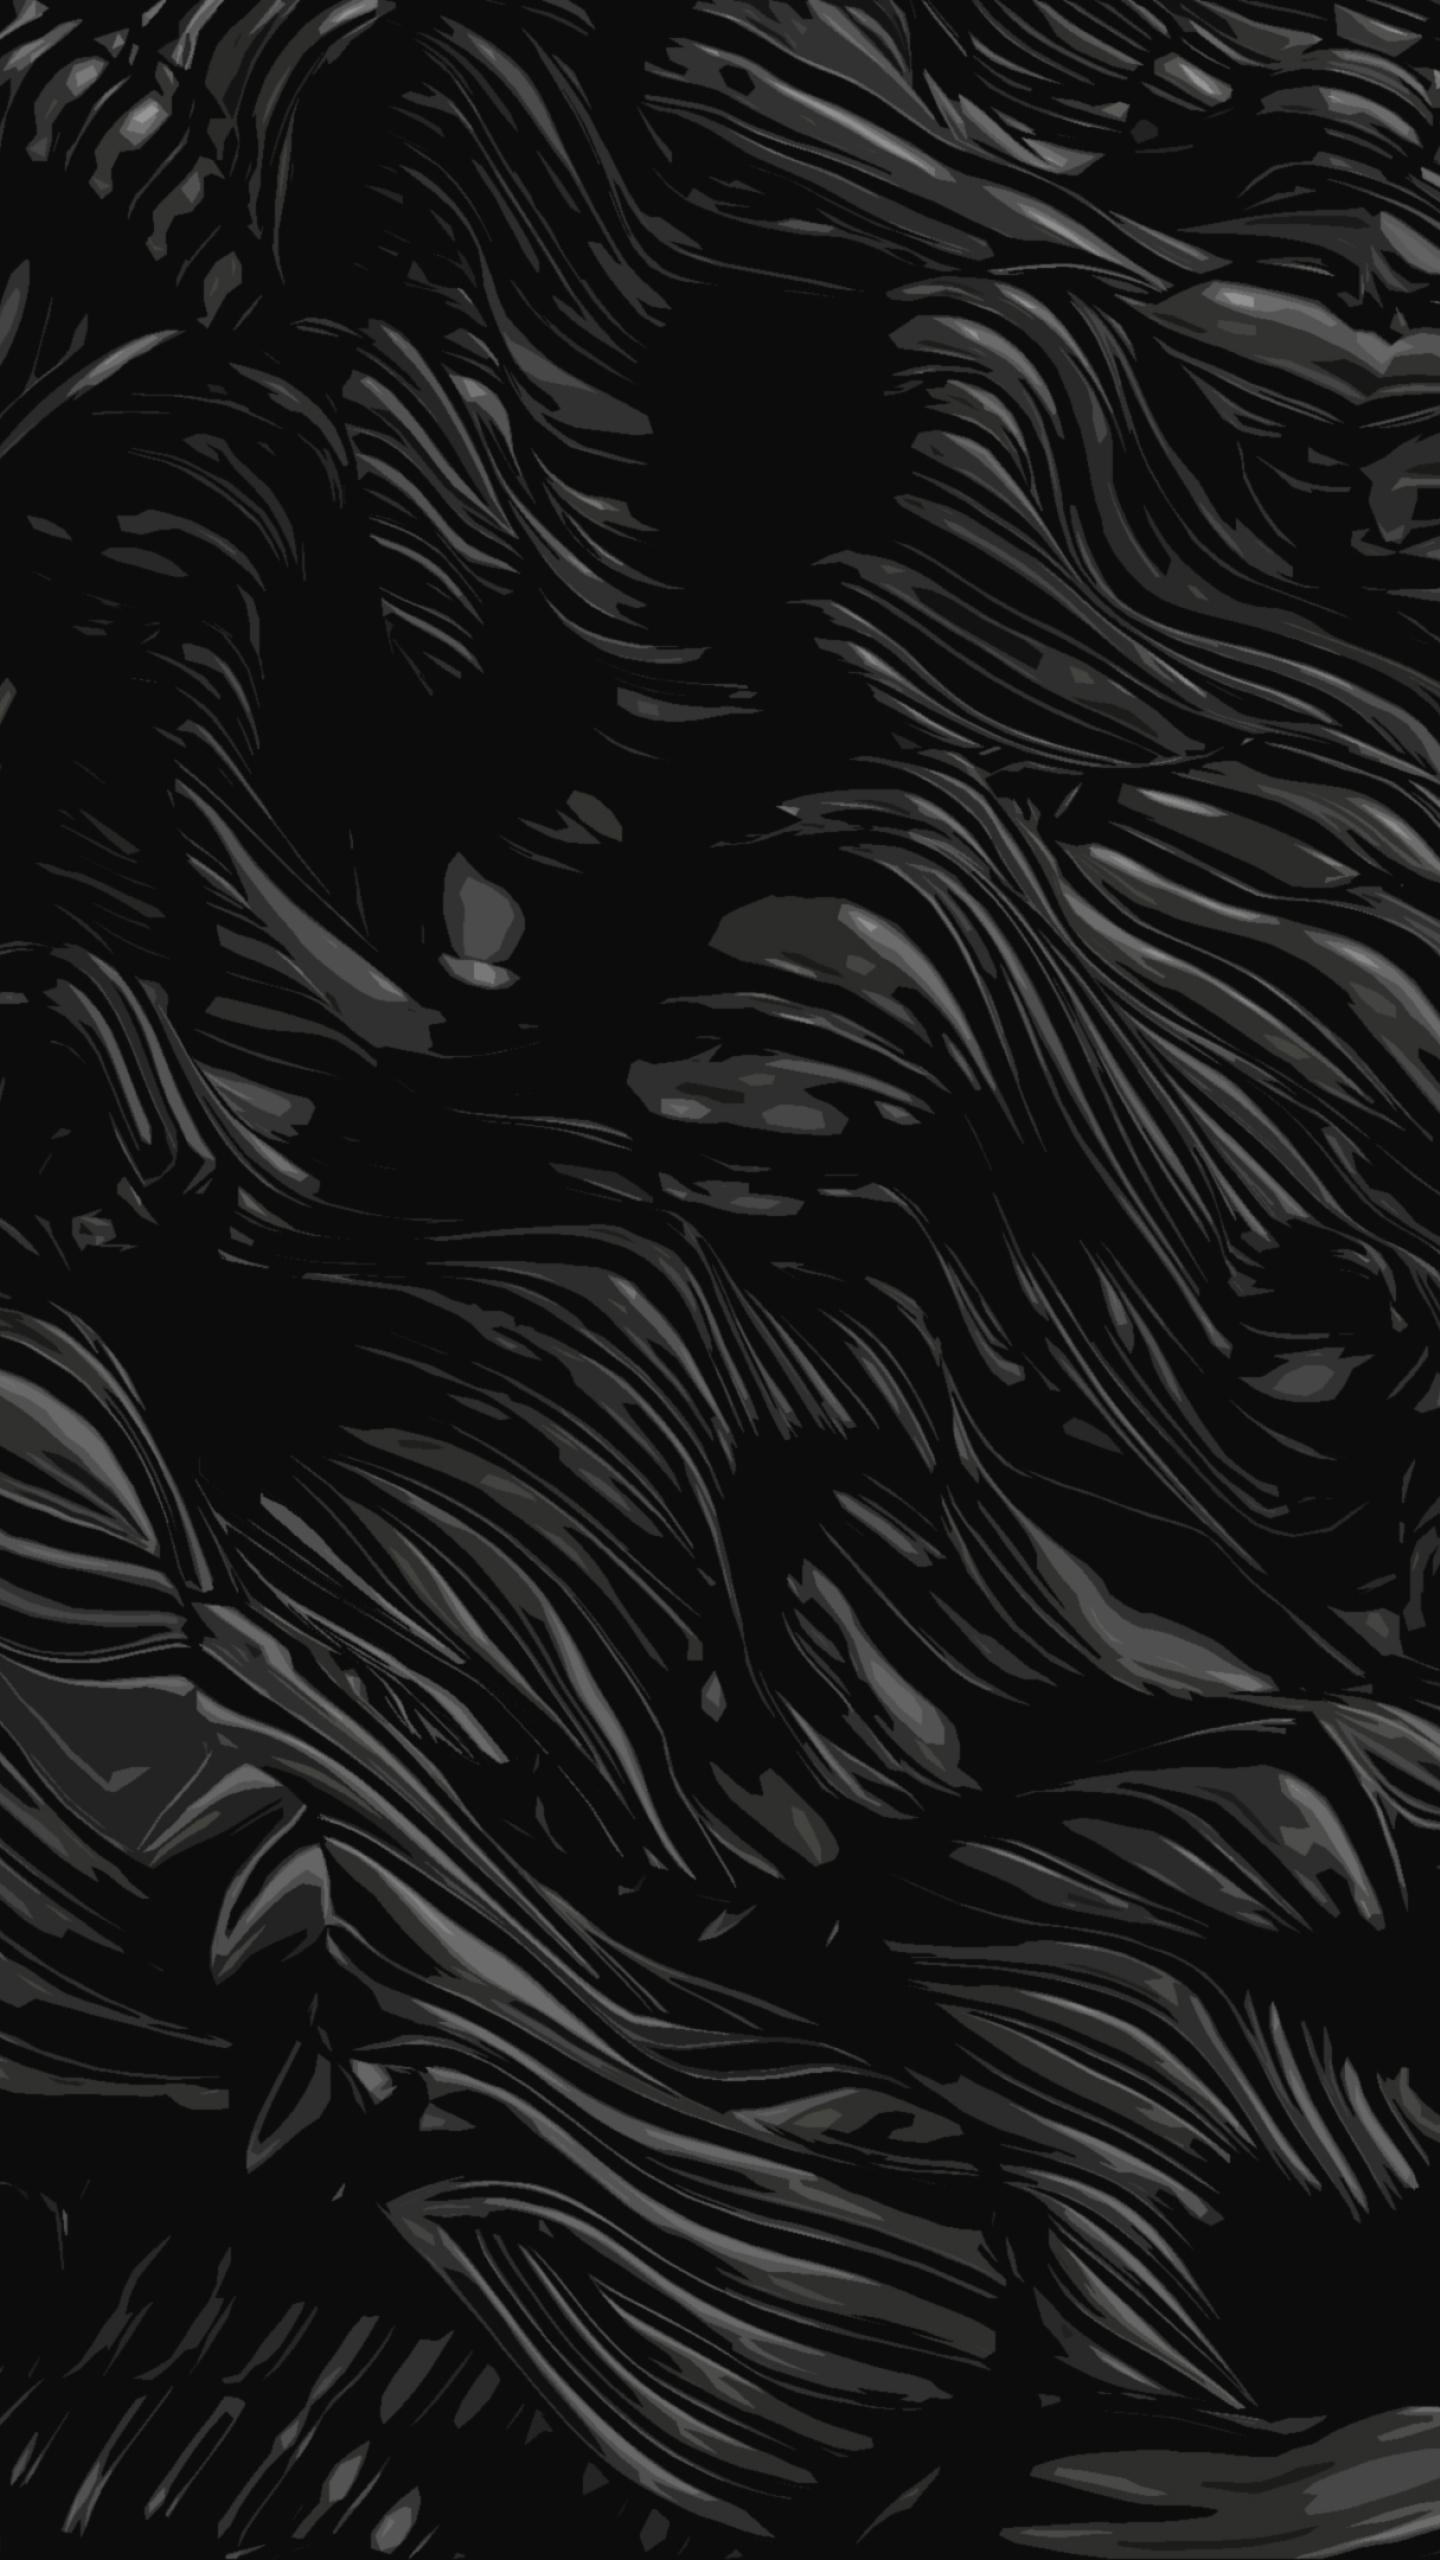 1440x2560 Black Abstract Dark Poster Oil Samsung Galaxy S6